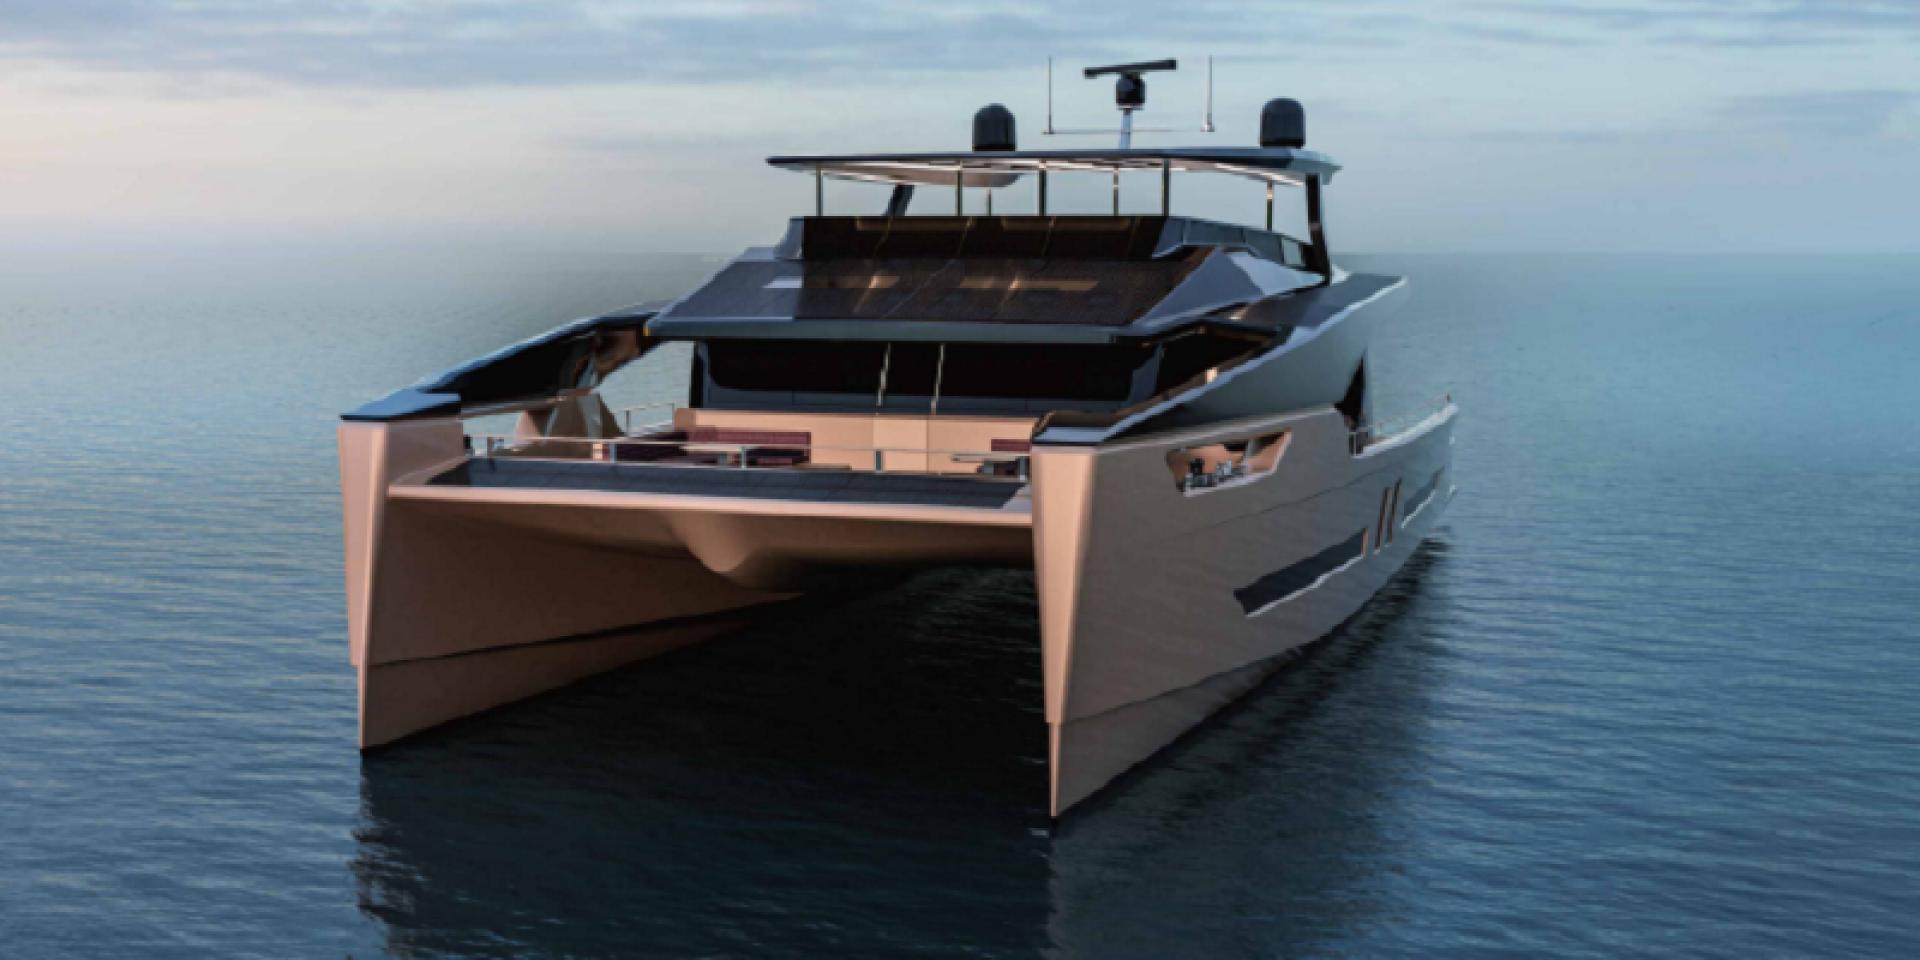 2023 Alva Yachts 90' Ocean ECO 90